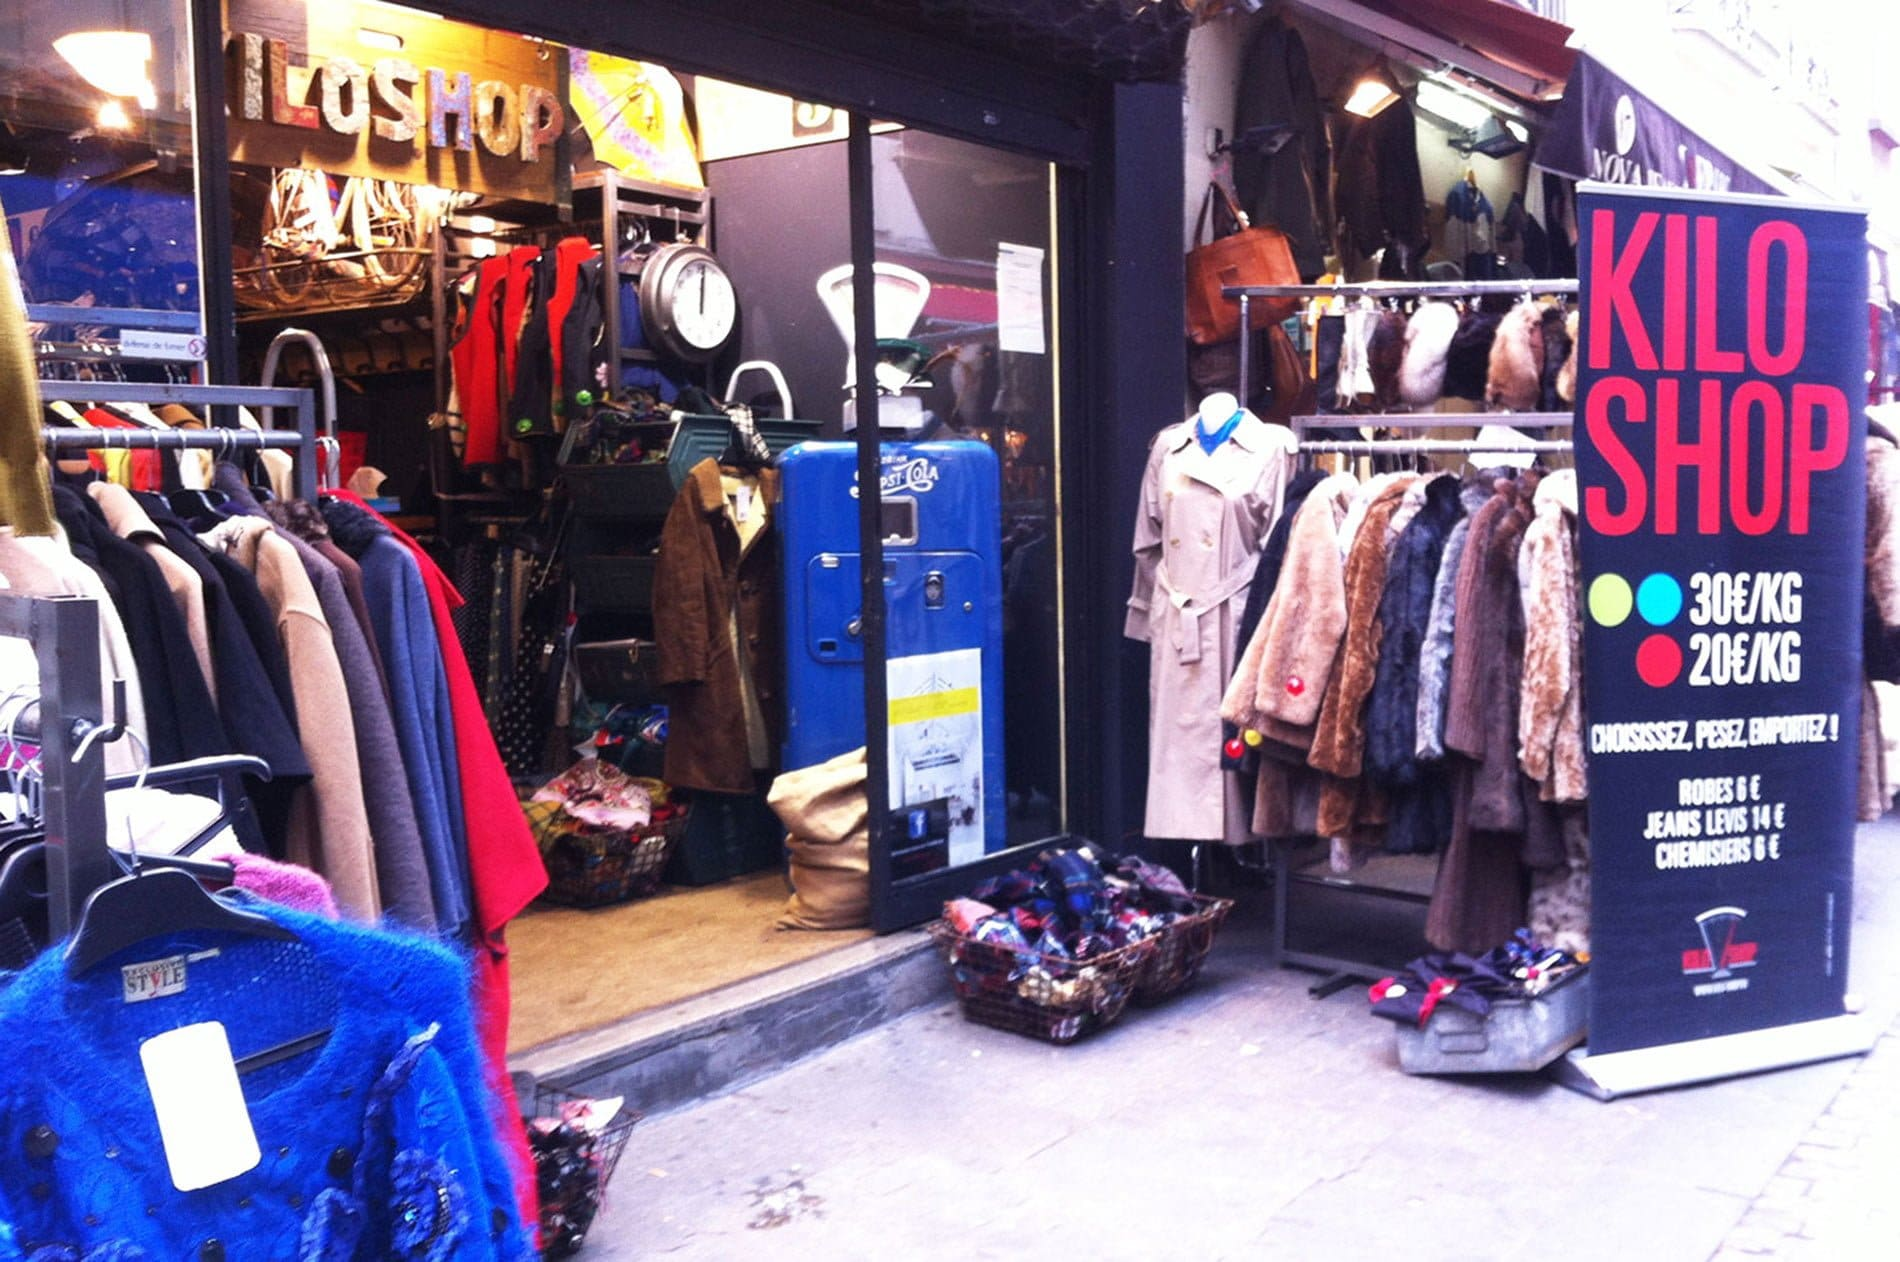 Friperie Kilo Shop rue Saint-Martin Paris - 22 v'la Scarlett